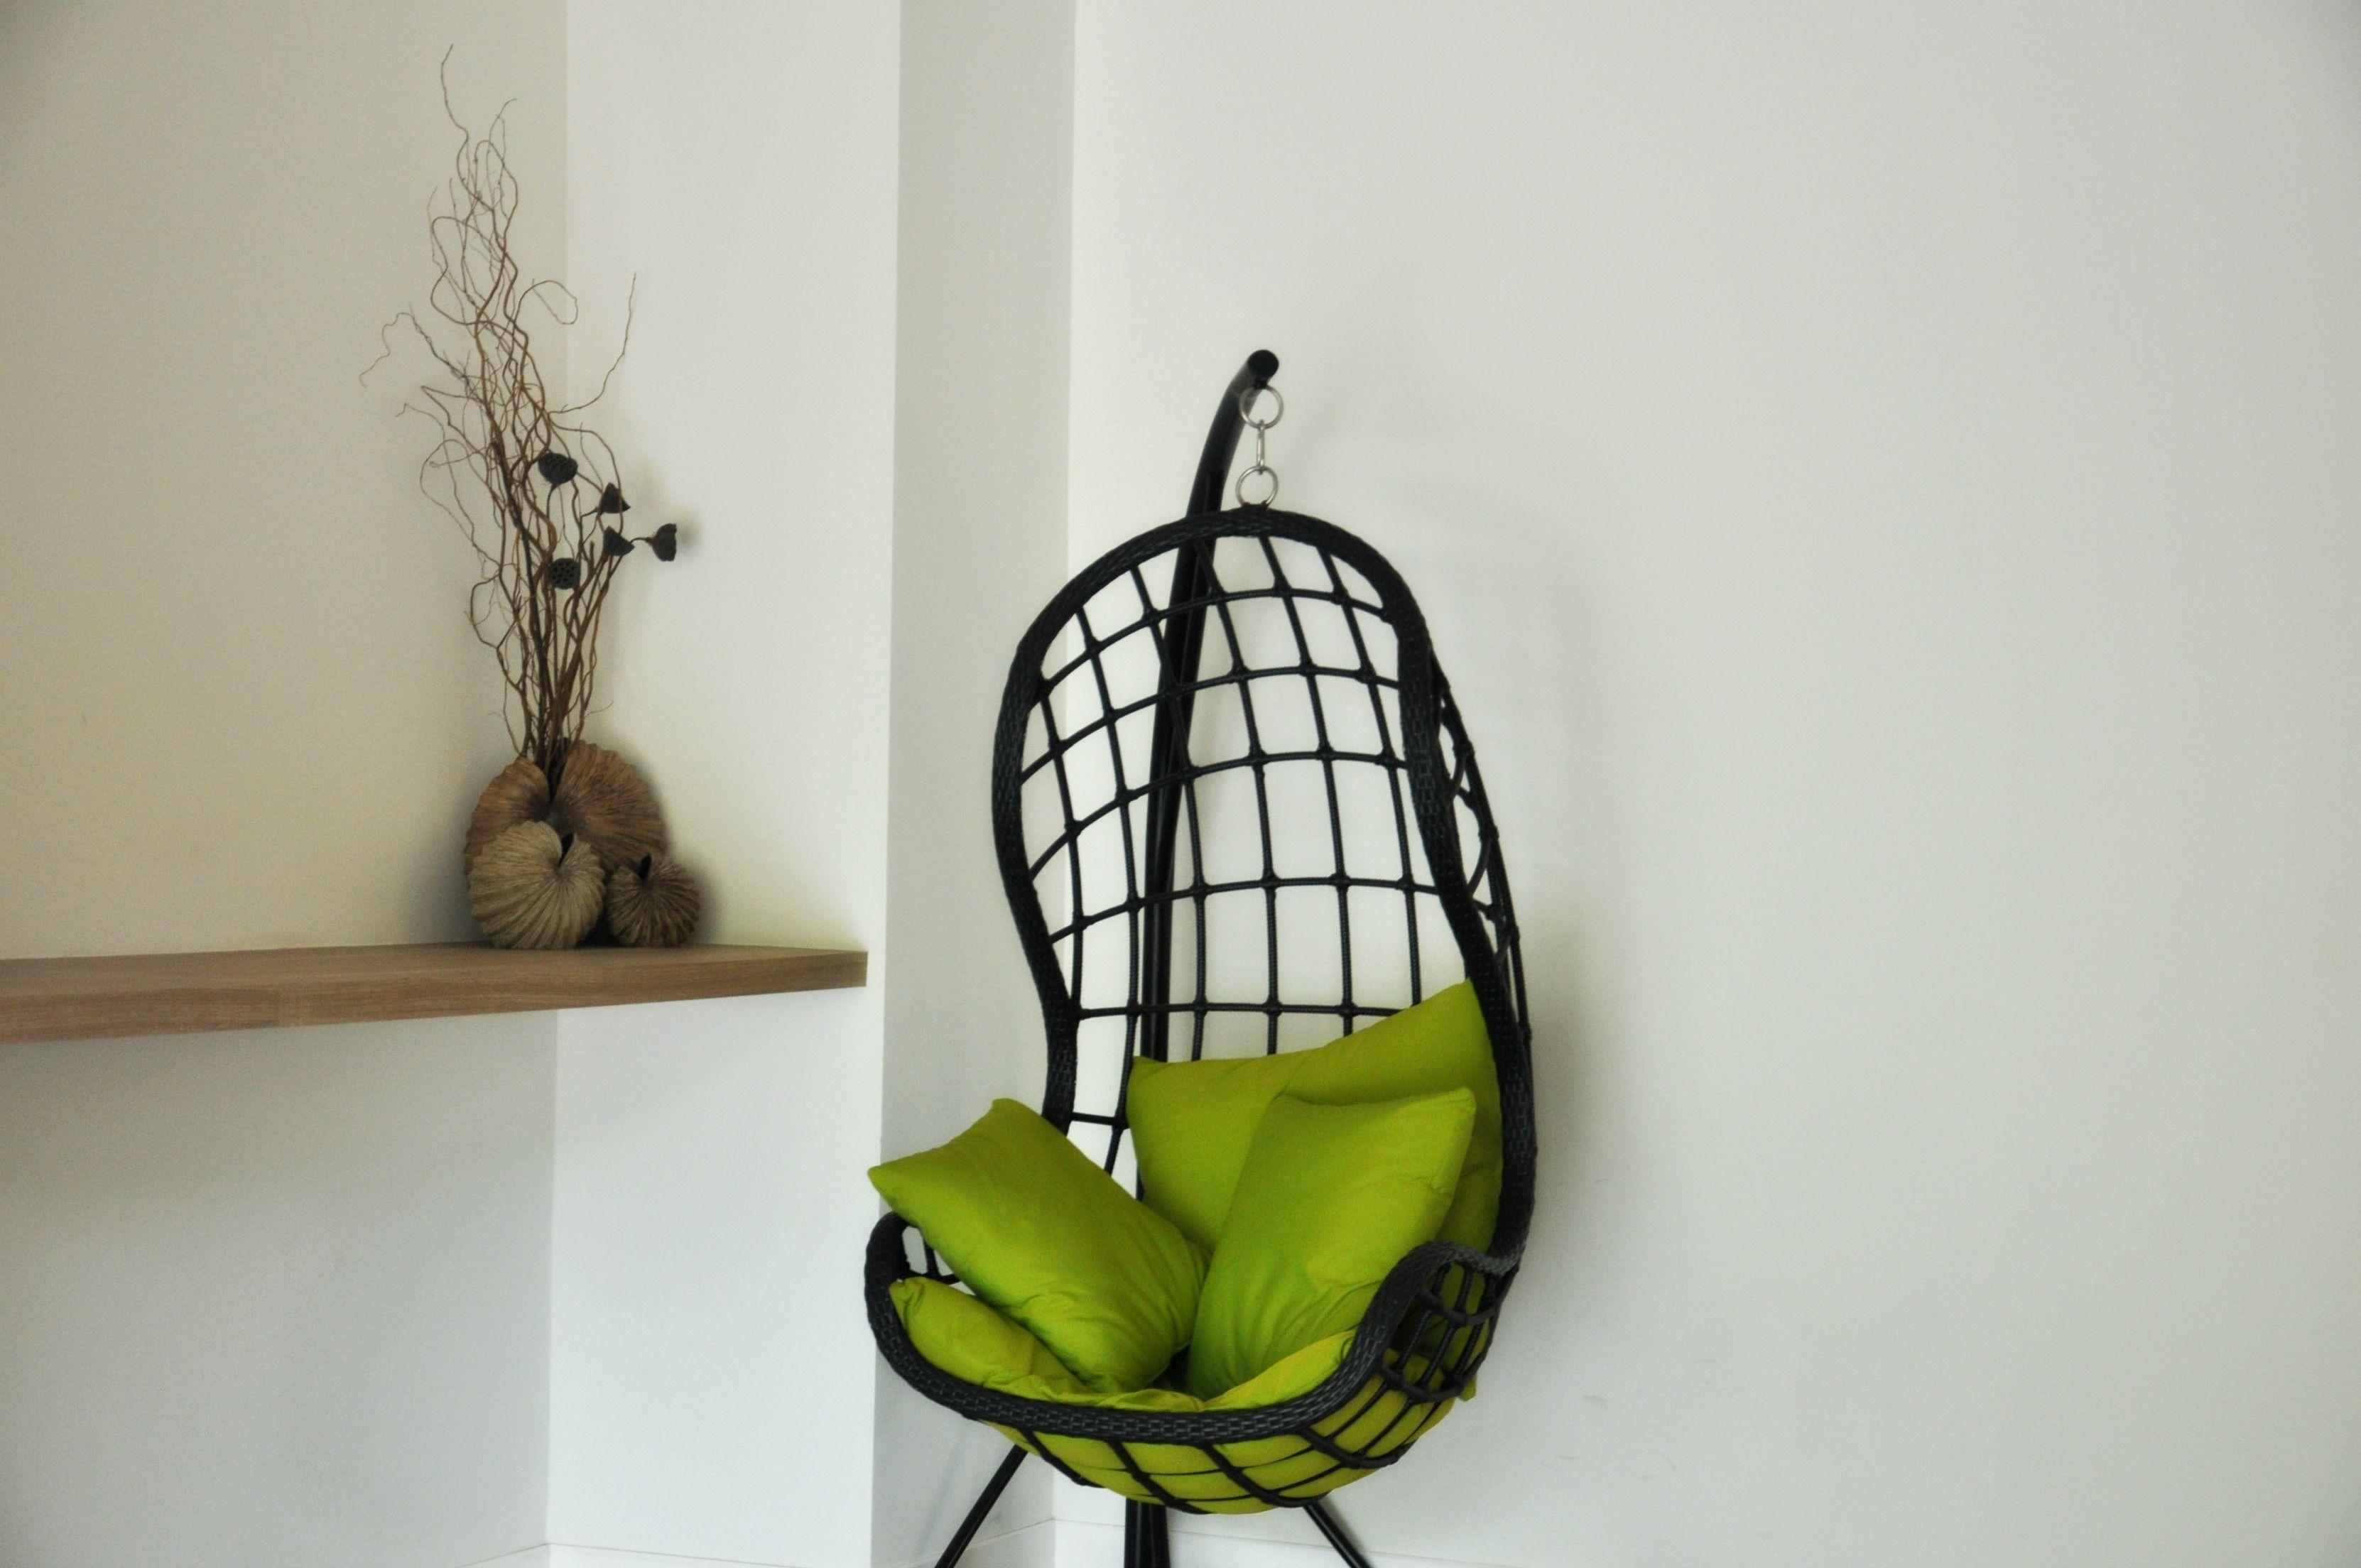 k nhswhdw sku durawood cedar hammocks chair single swinging nags duracord xx hardware rope swing nhdwsstanc head replacement tan